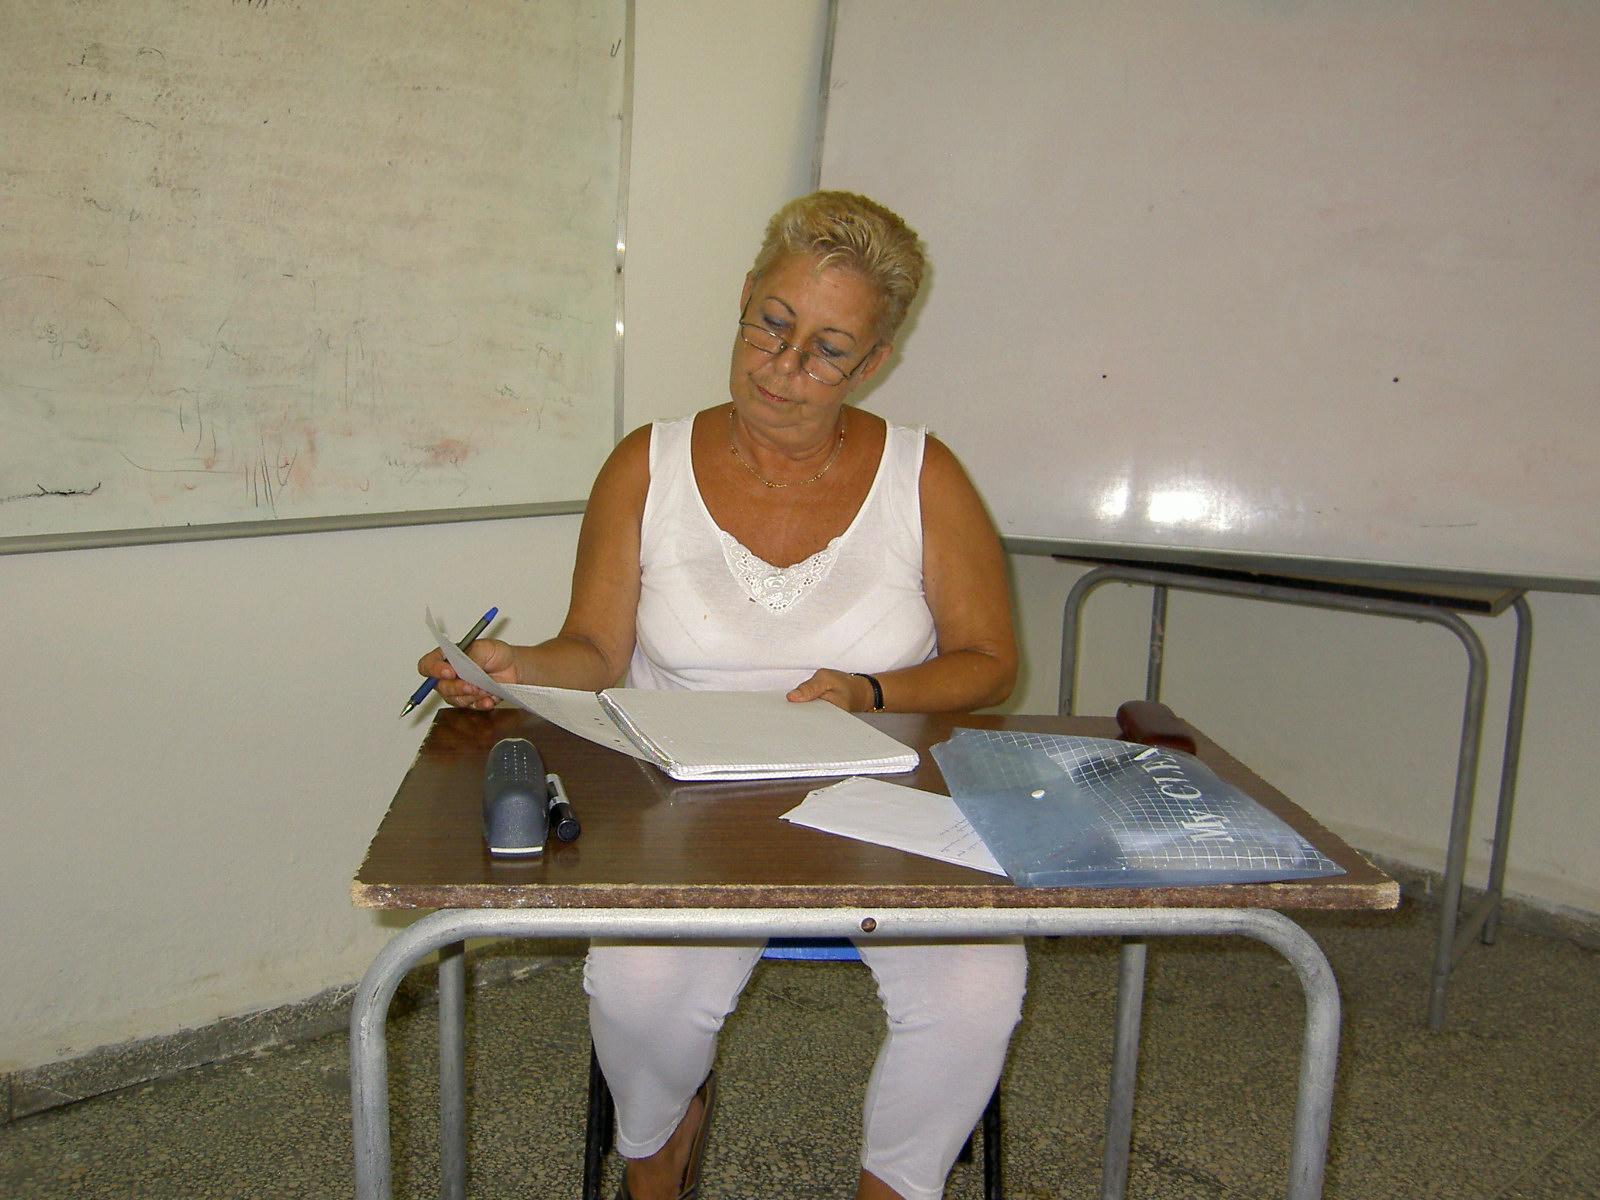 David juni 2005, Kuba juli 2005 149